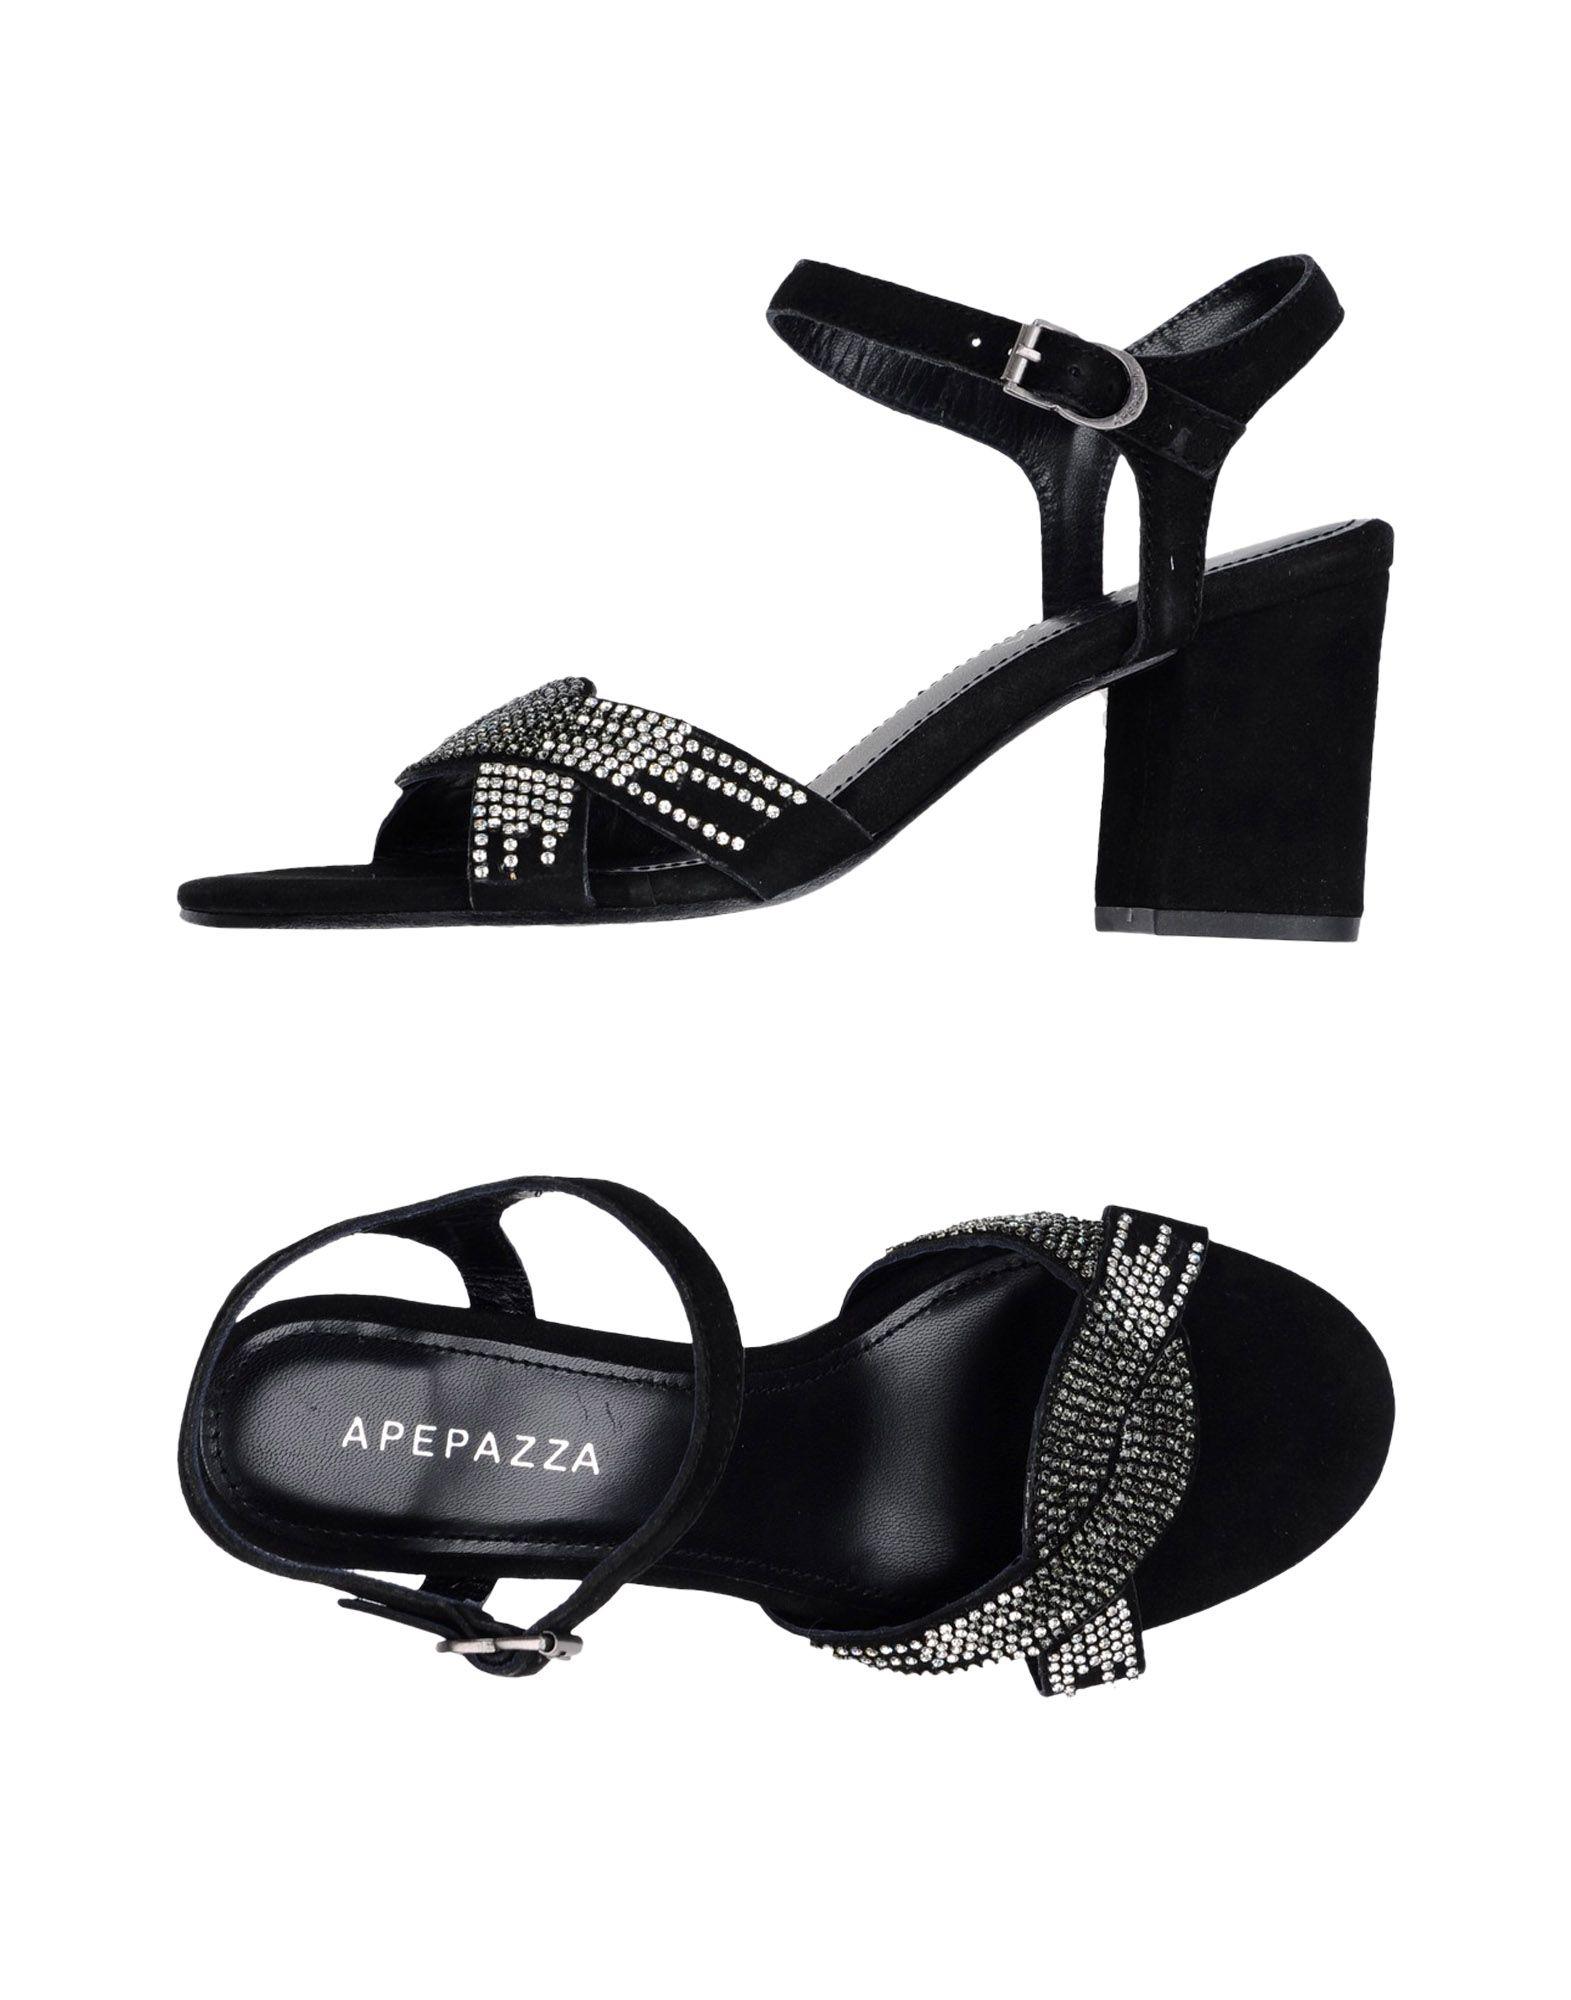 Moda Sandali Apepazza Donna Donna Apepazza - 11364904WC d08e82